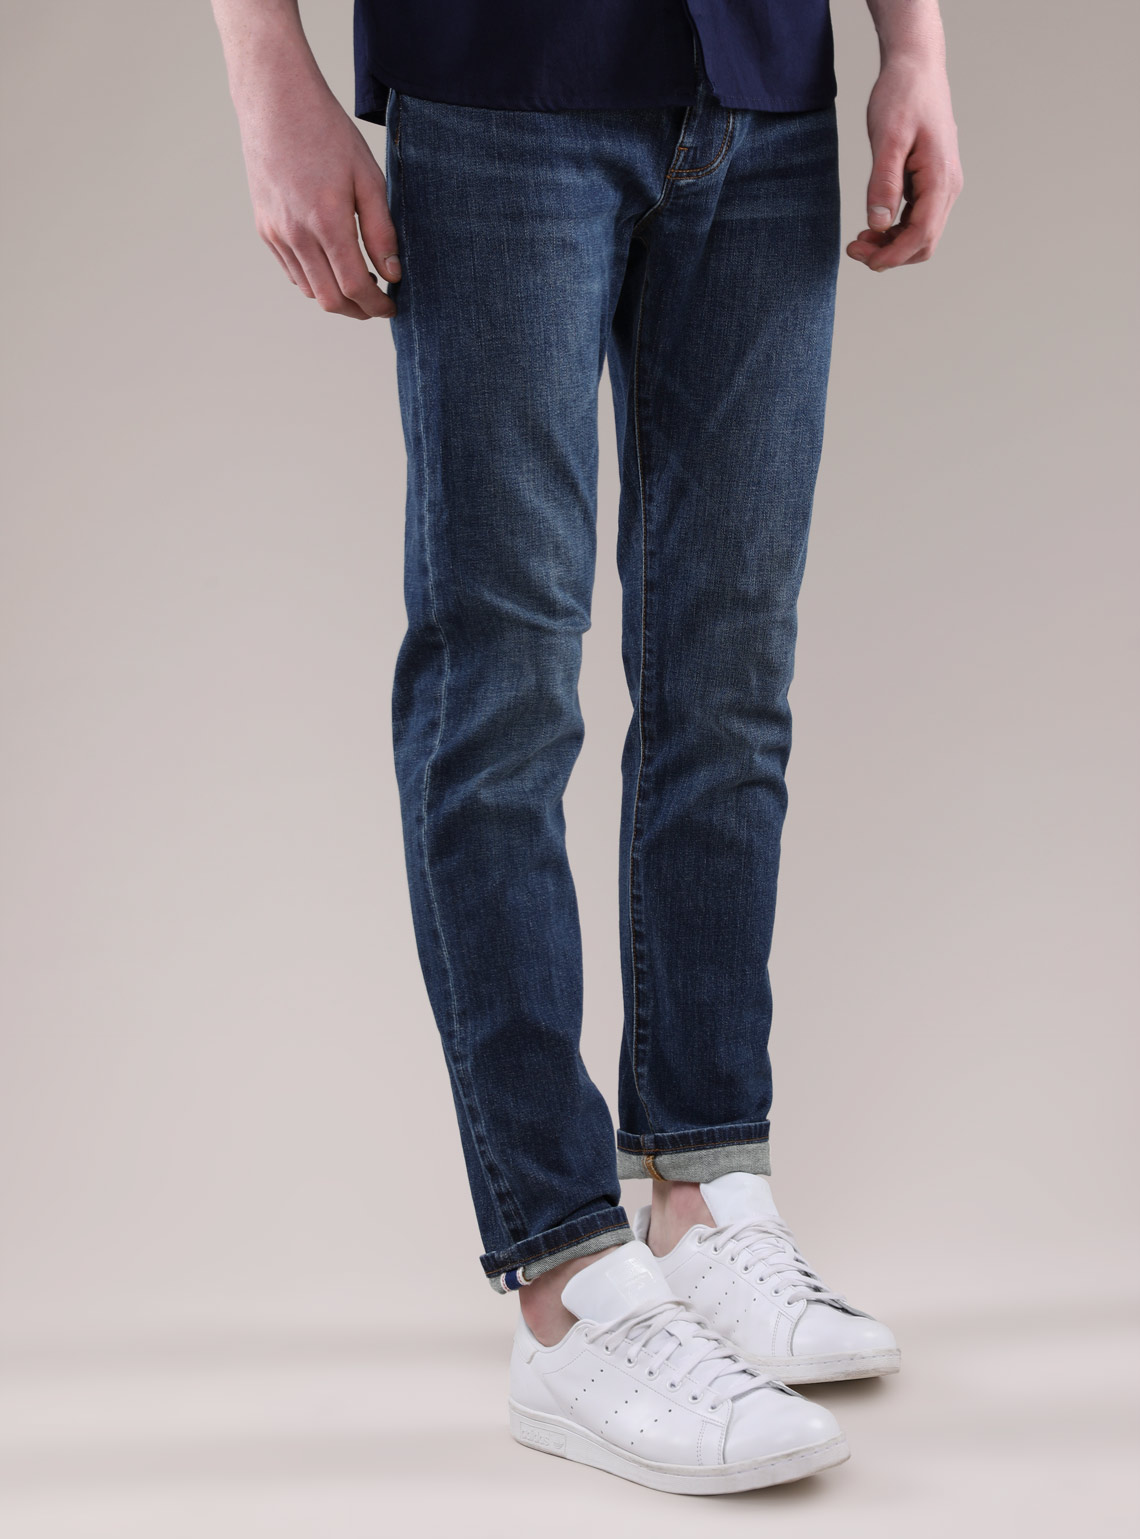 Men's Japanese Denim Slim Jeans